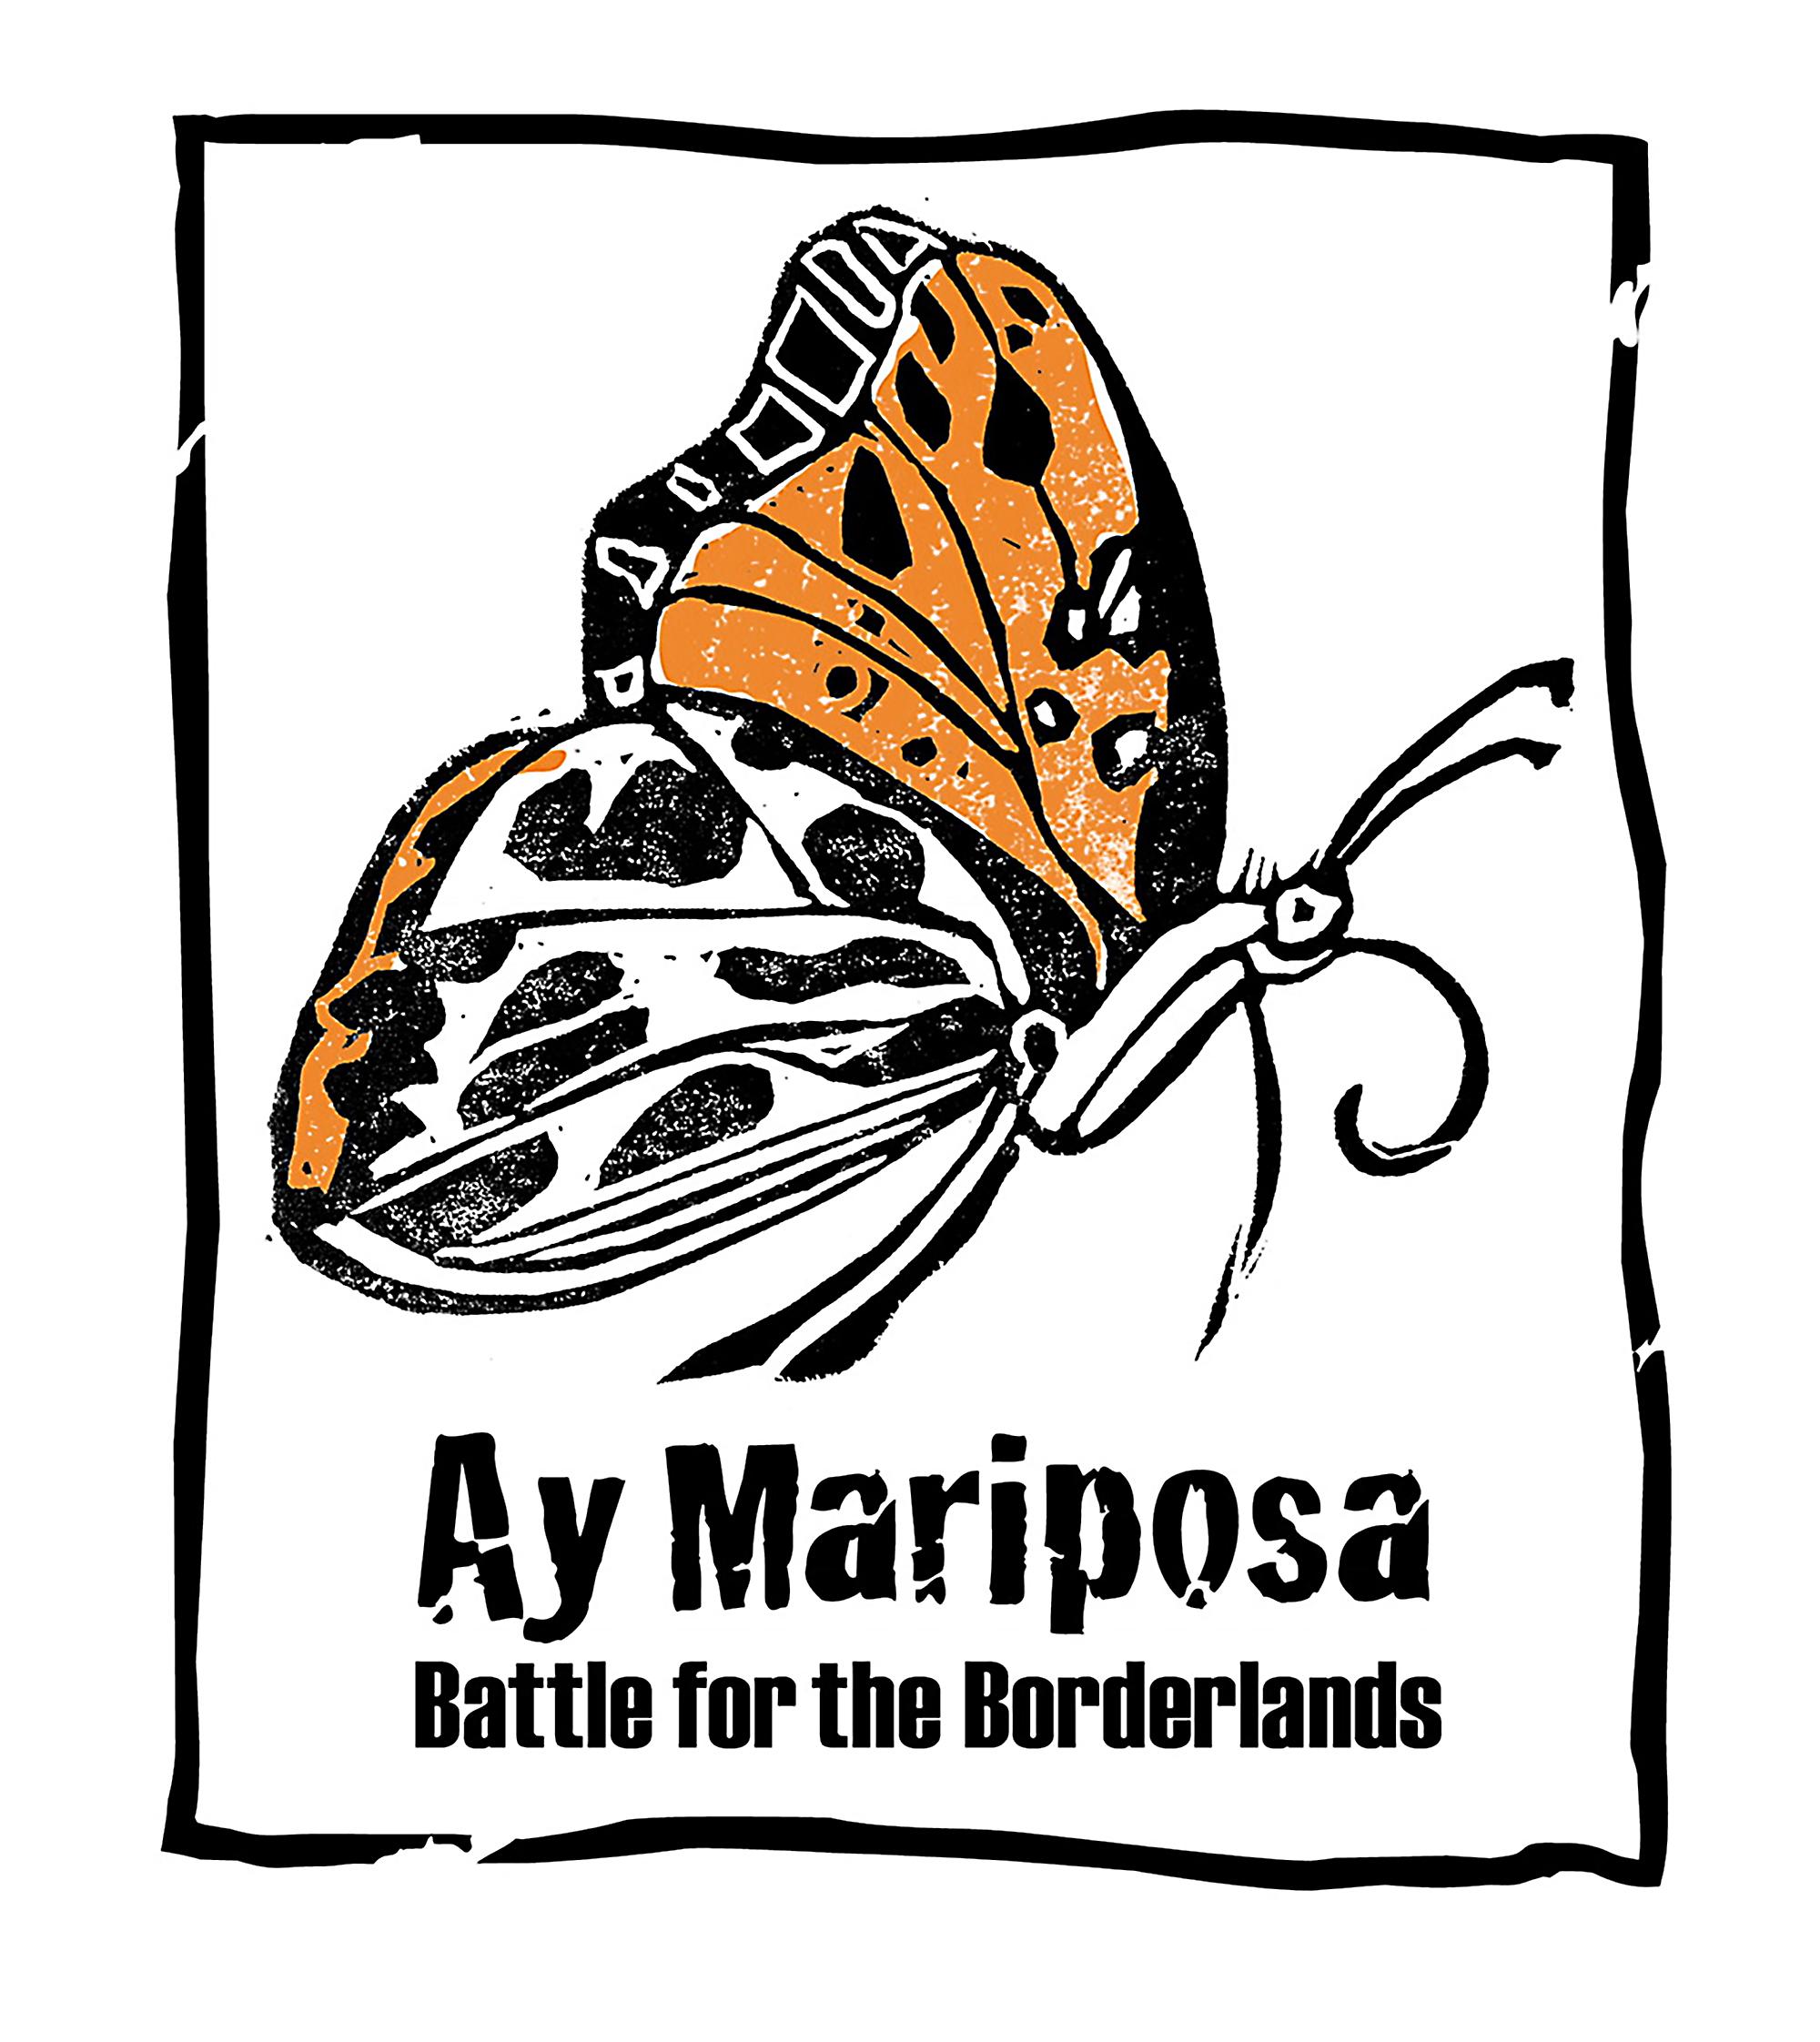 Ay Mariposa Documentary Campaign